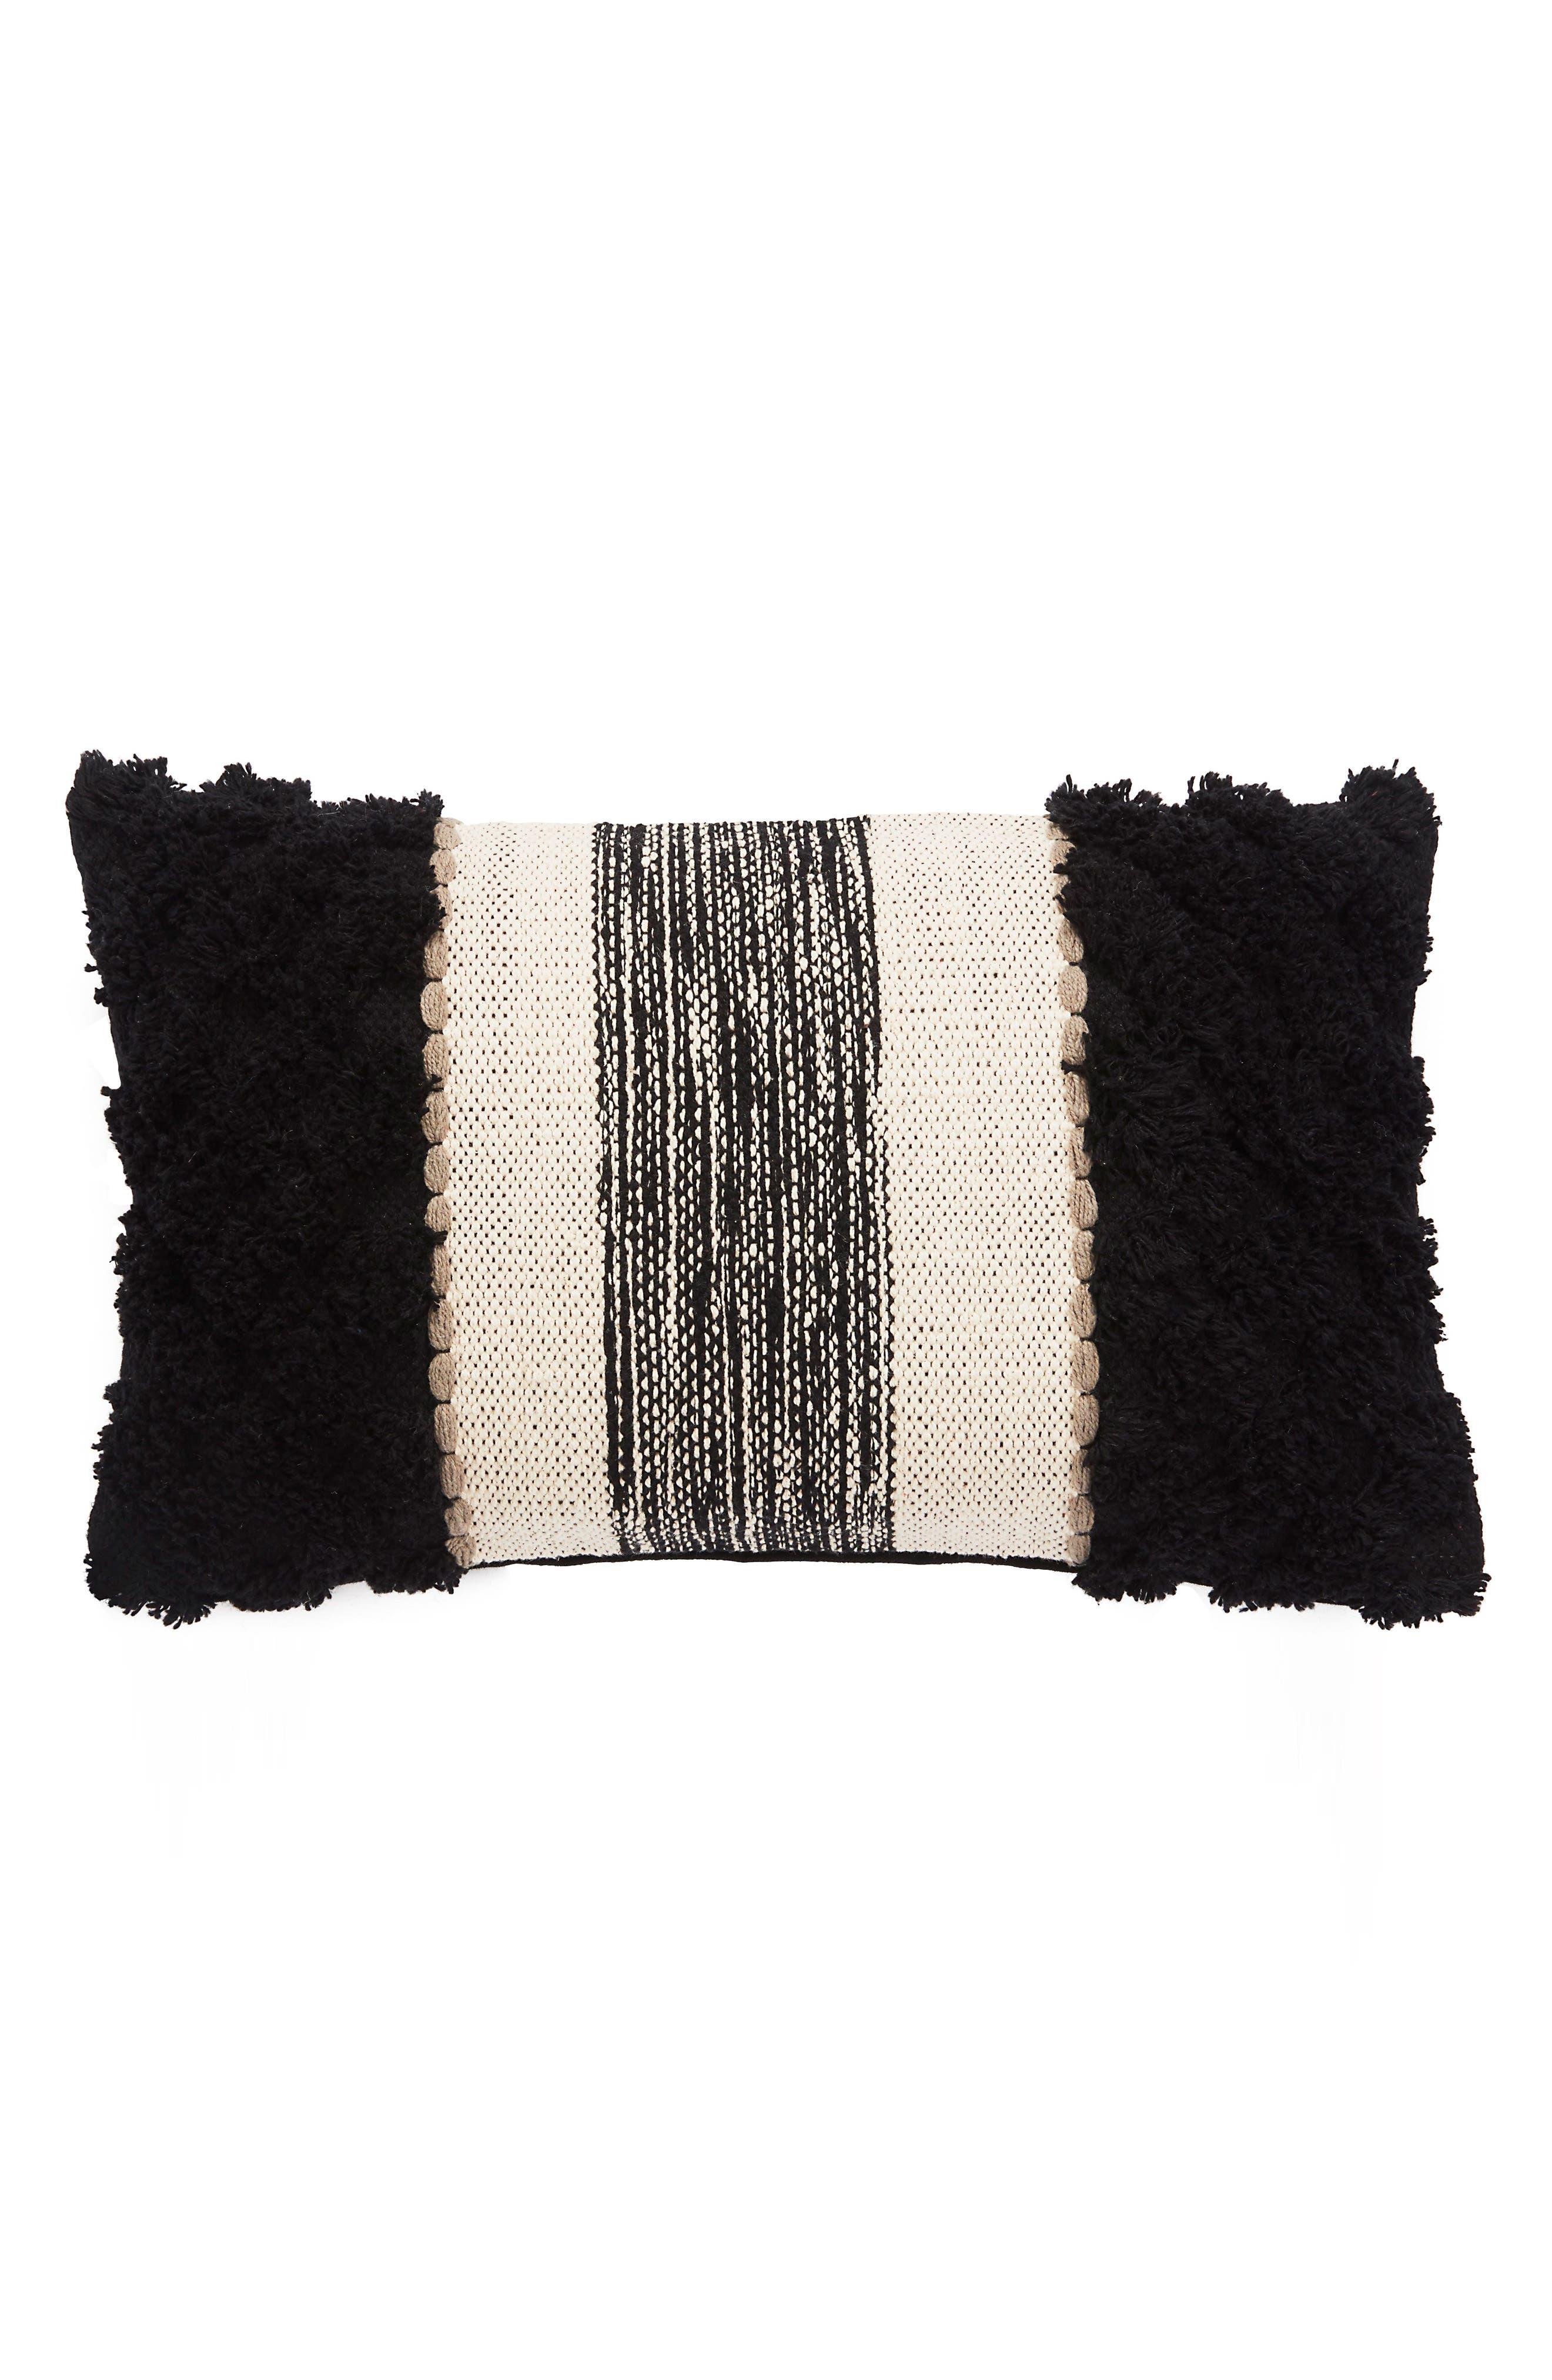 Jaipur Accent Pillow